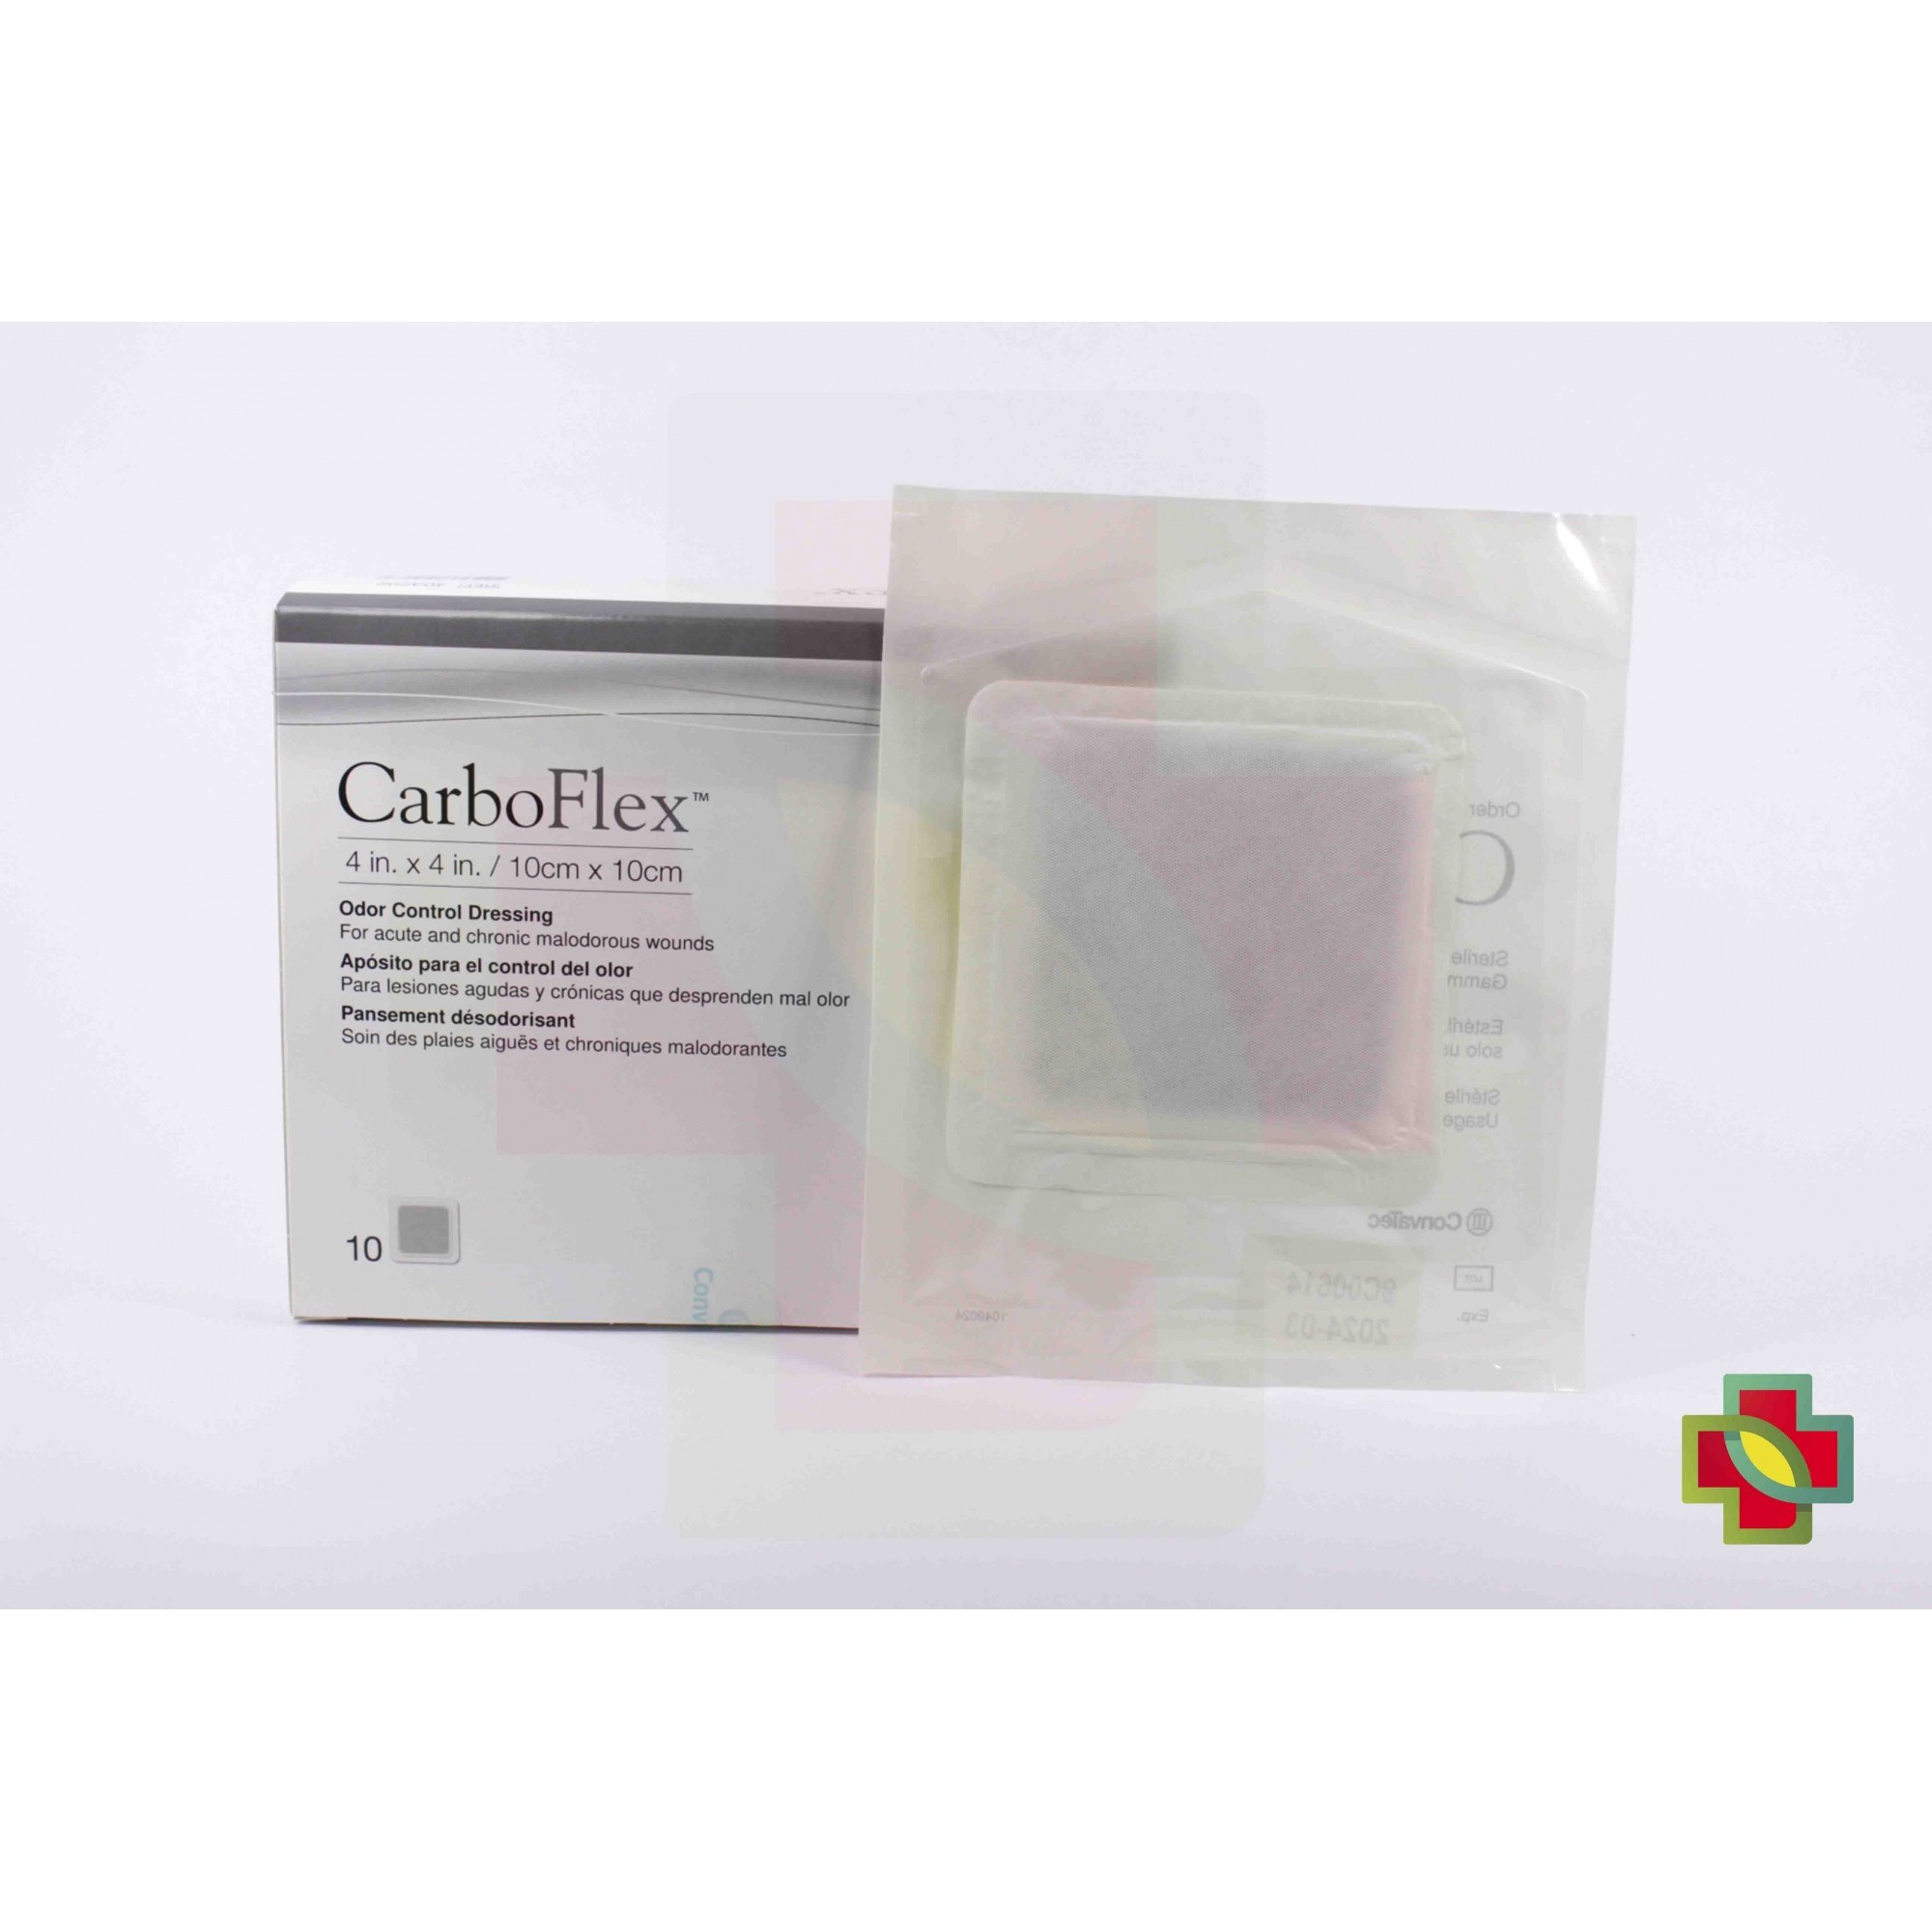 CURATIVO CARBOFLEX 10CM X 10CM (10 UNDS) 403202 - CONVATEC